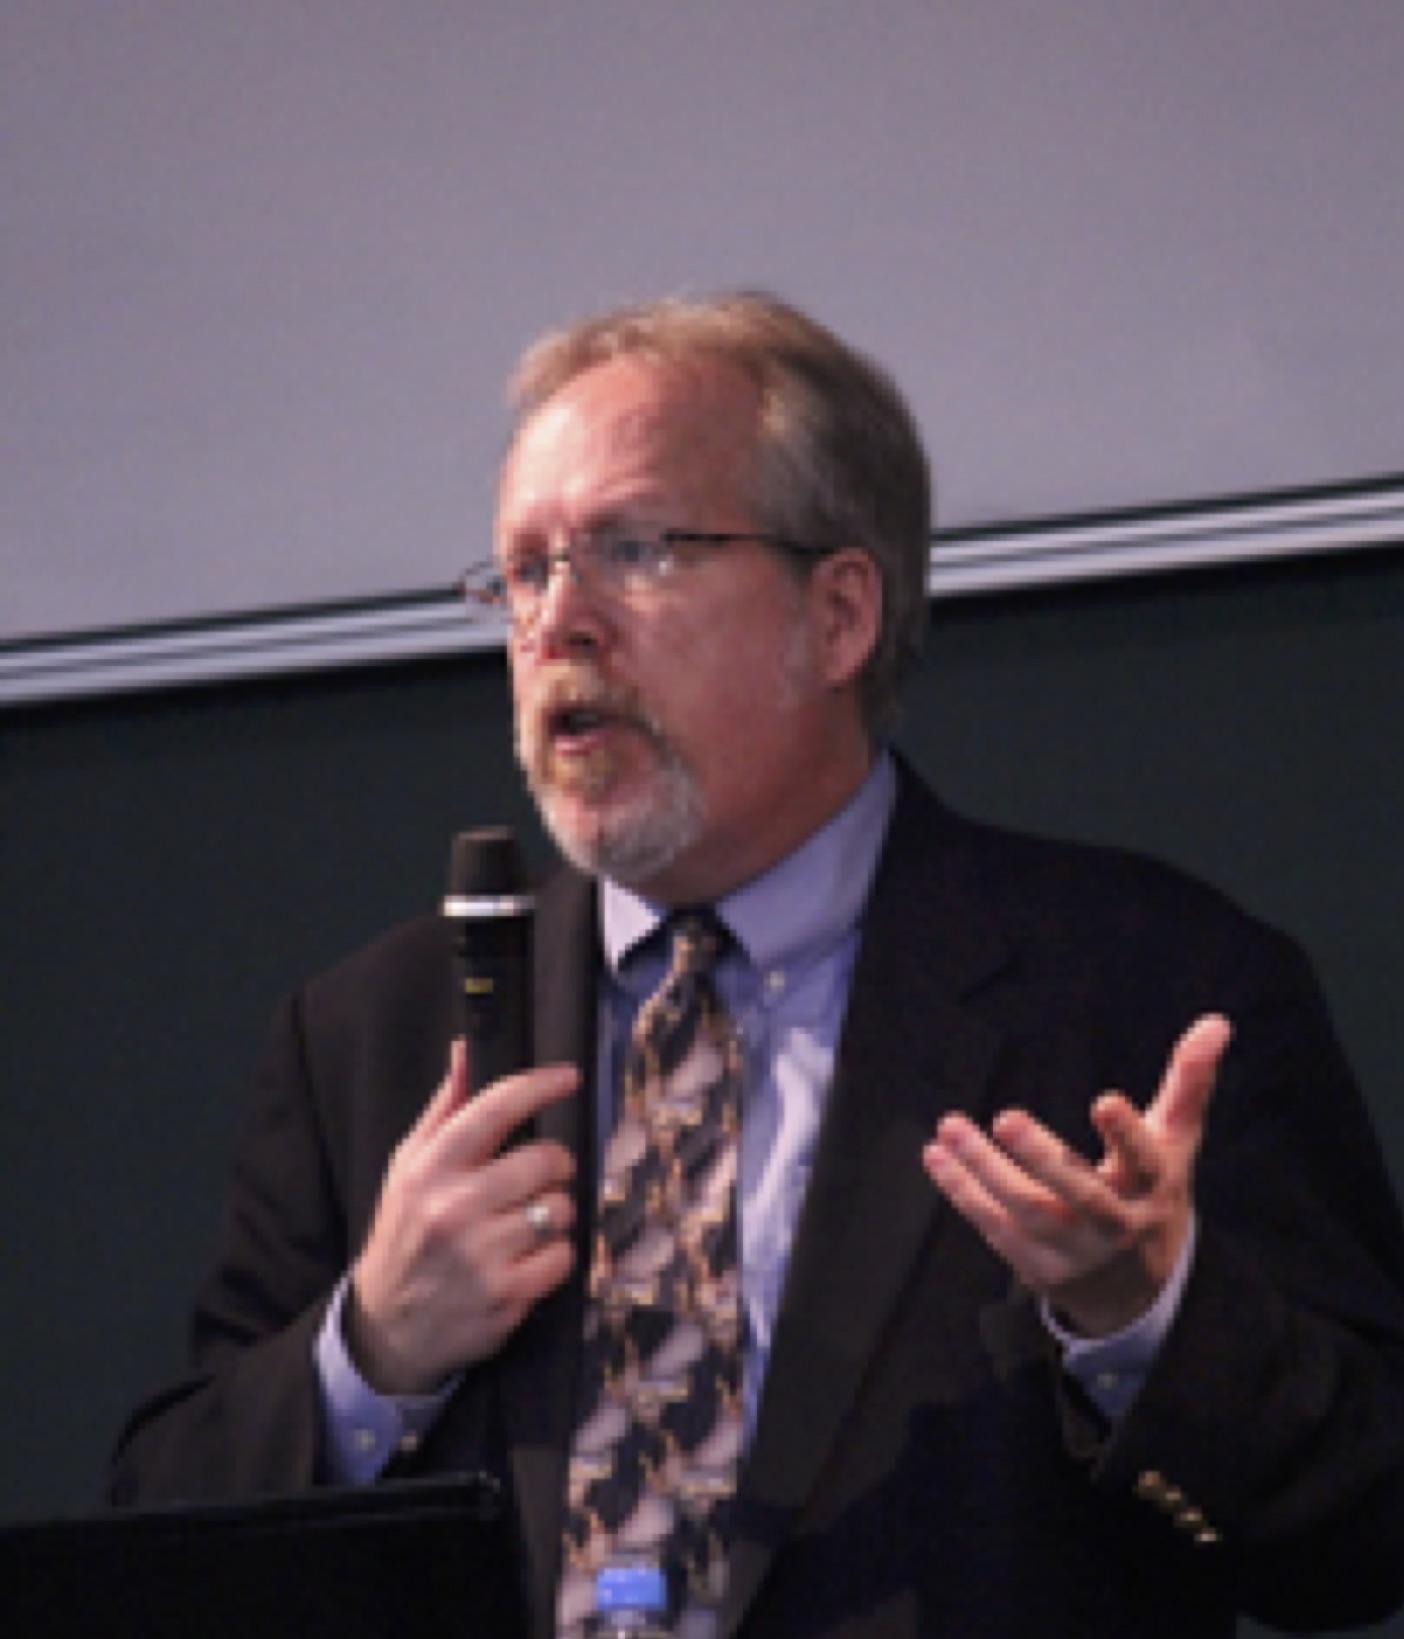 Keynote speaker David R. Parker